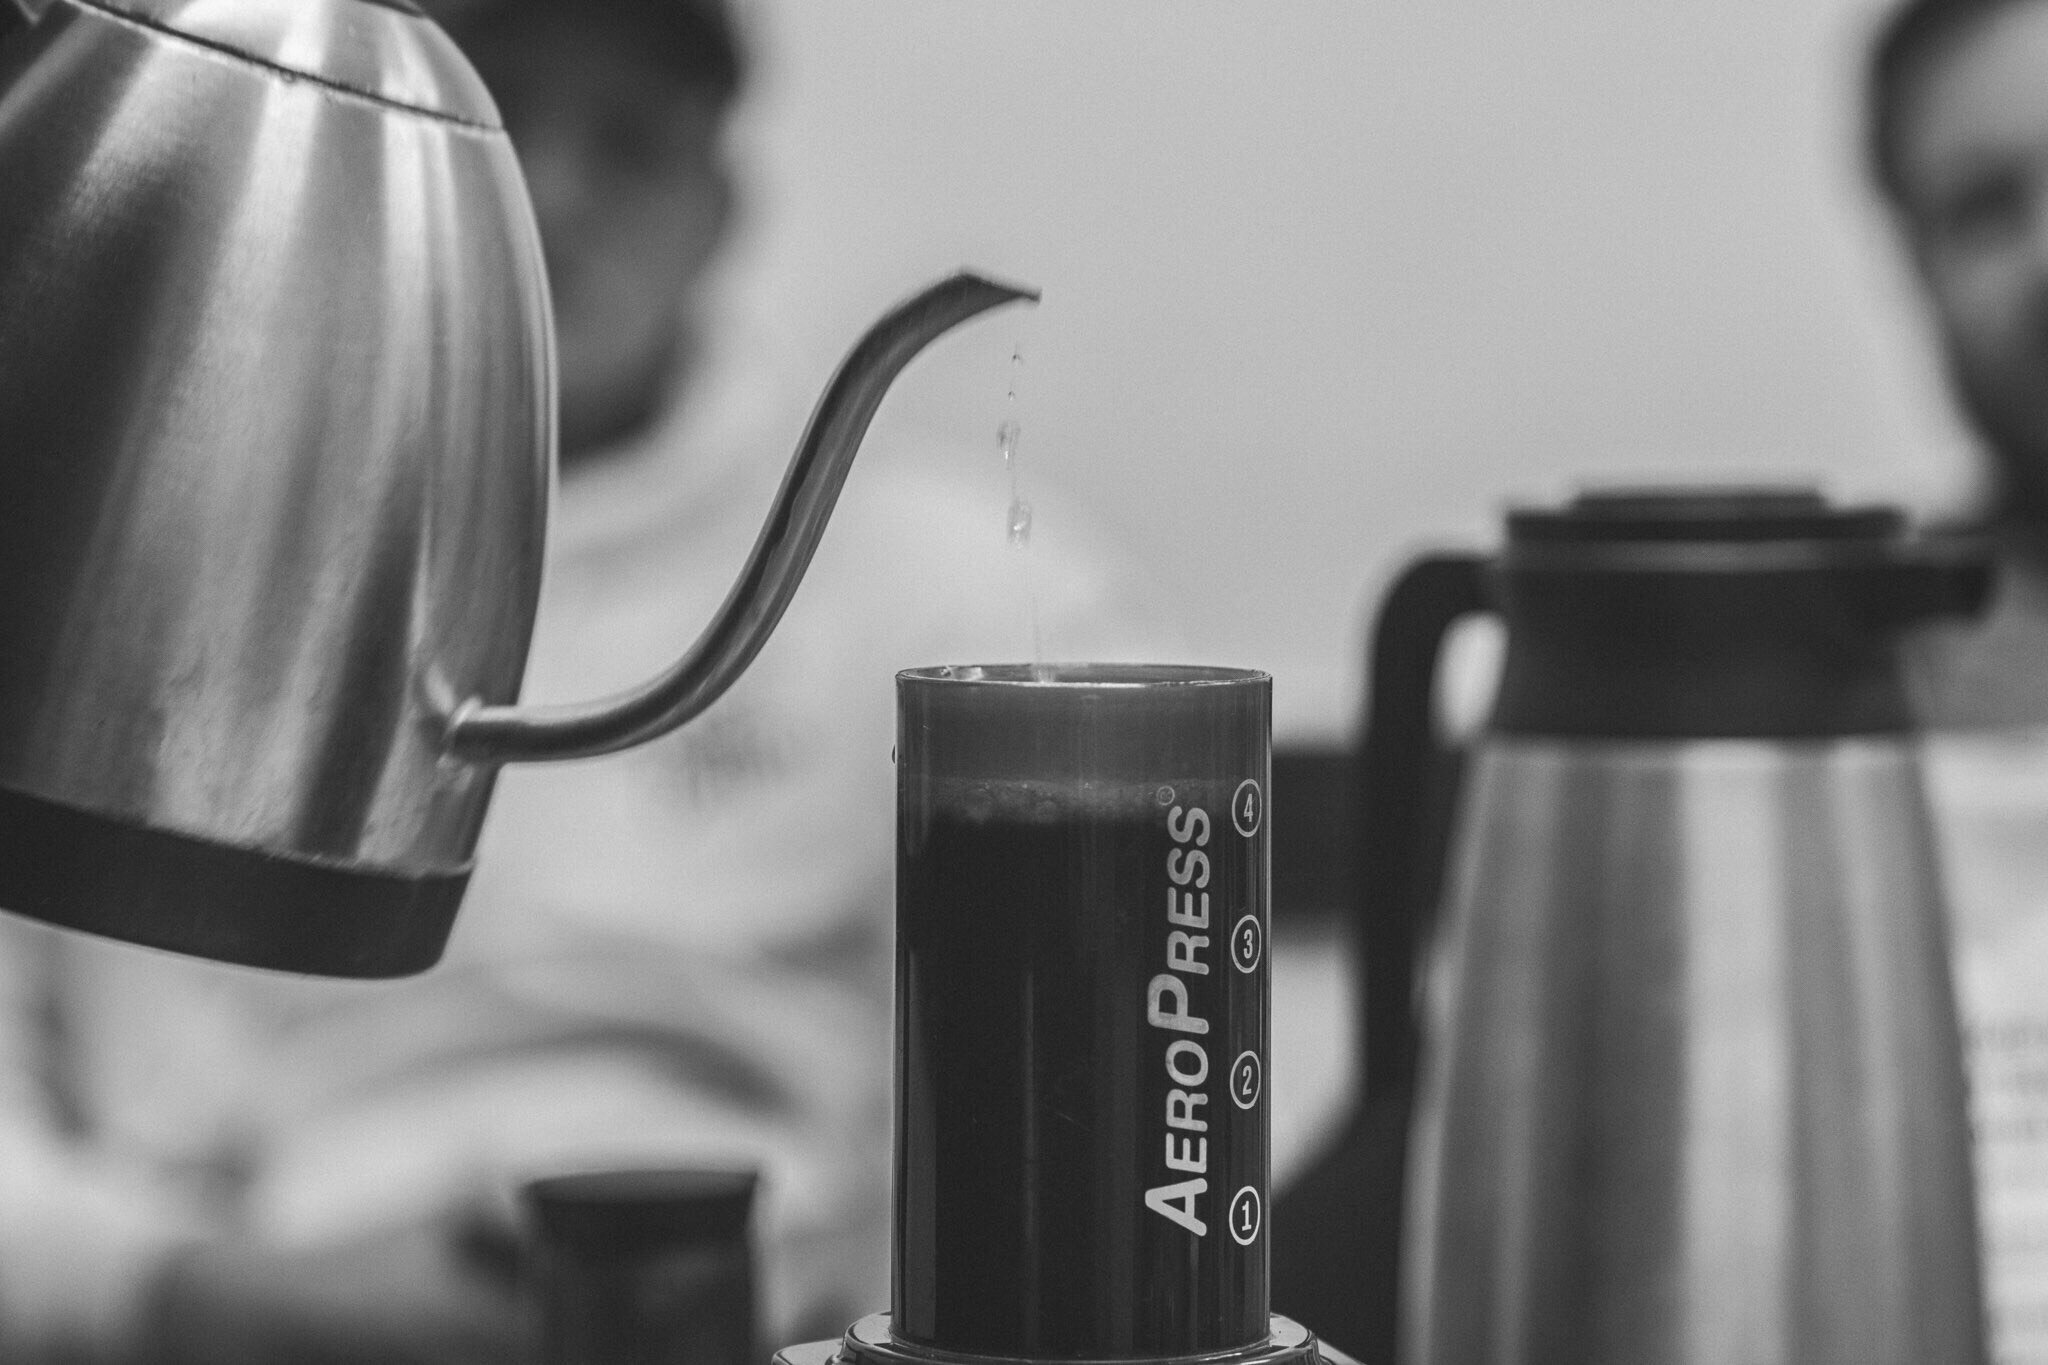 Brewing an AeroPress with a Bona Vita Kettle